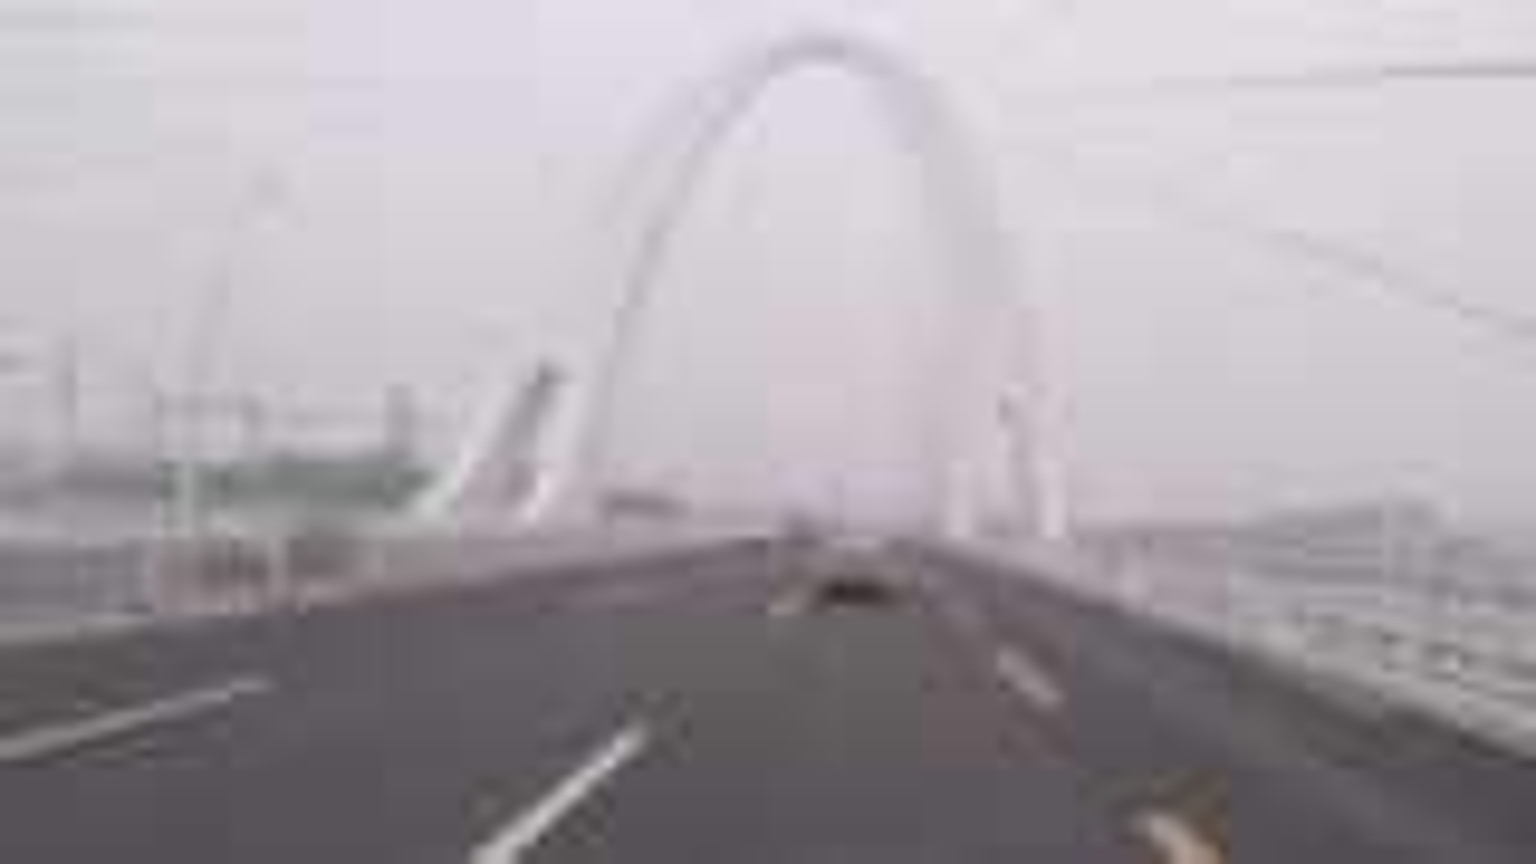 DL250通勤打卡-也不知道这天是雾还是霾